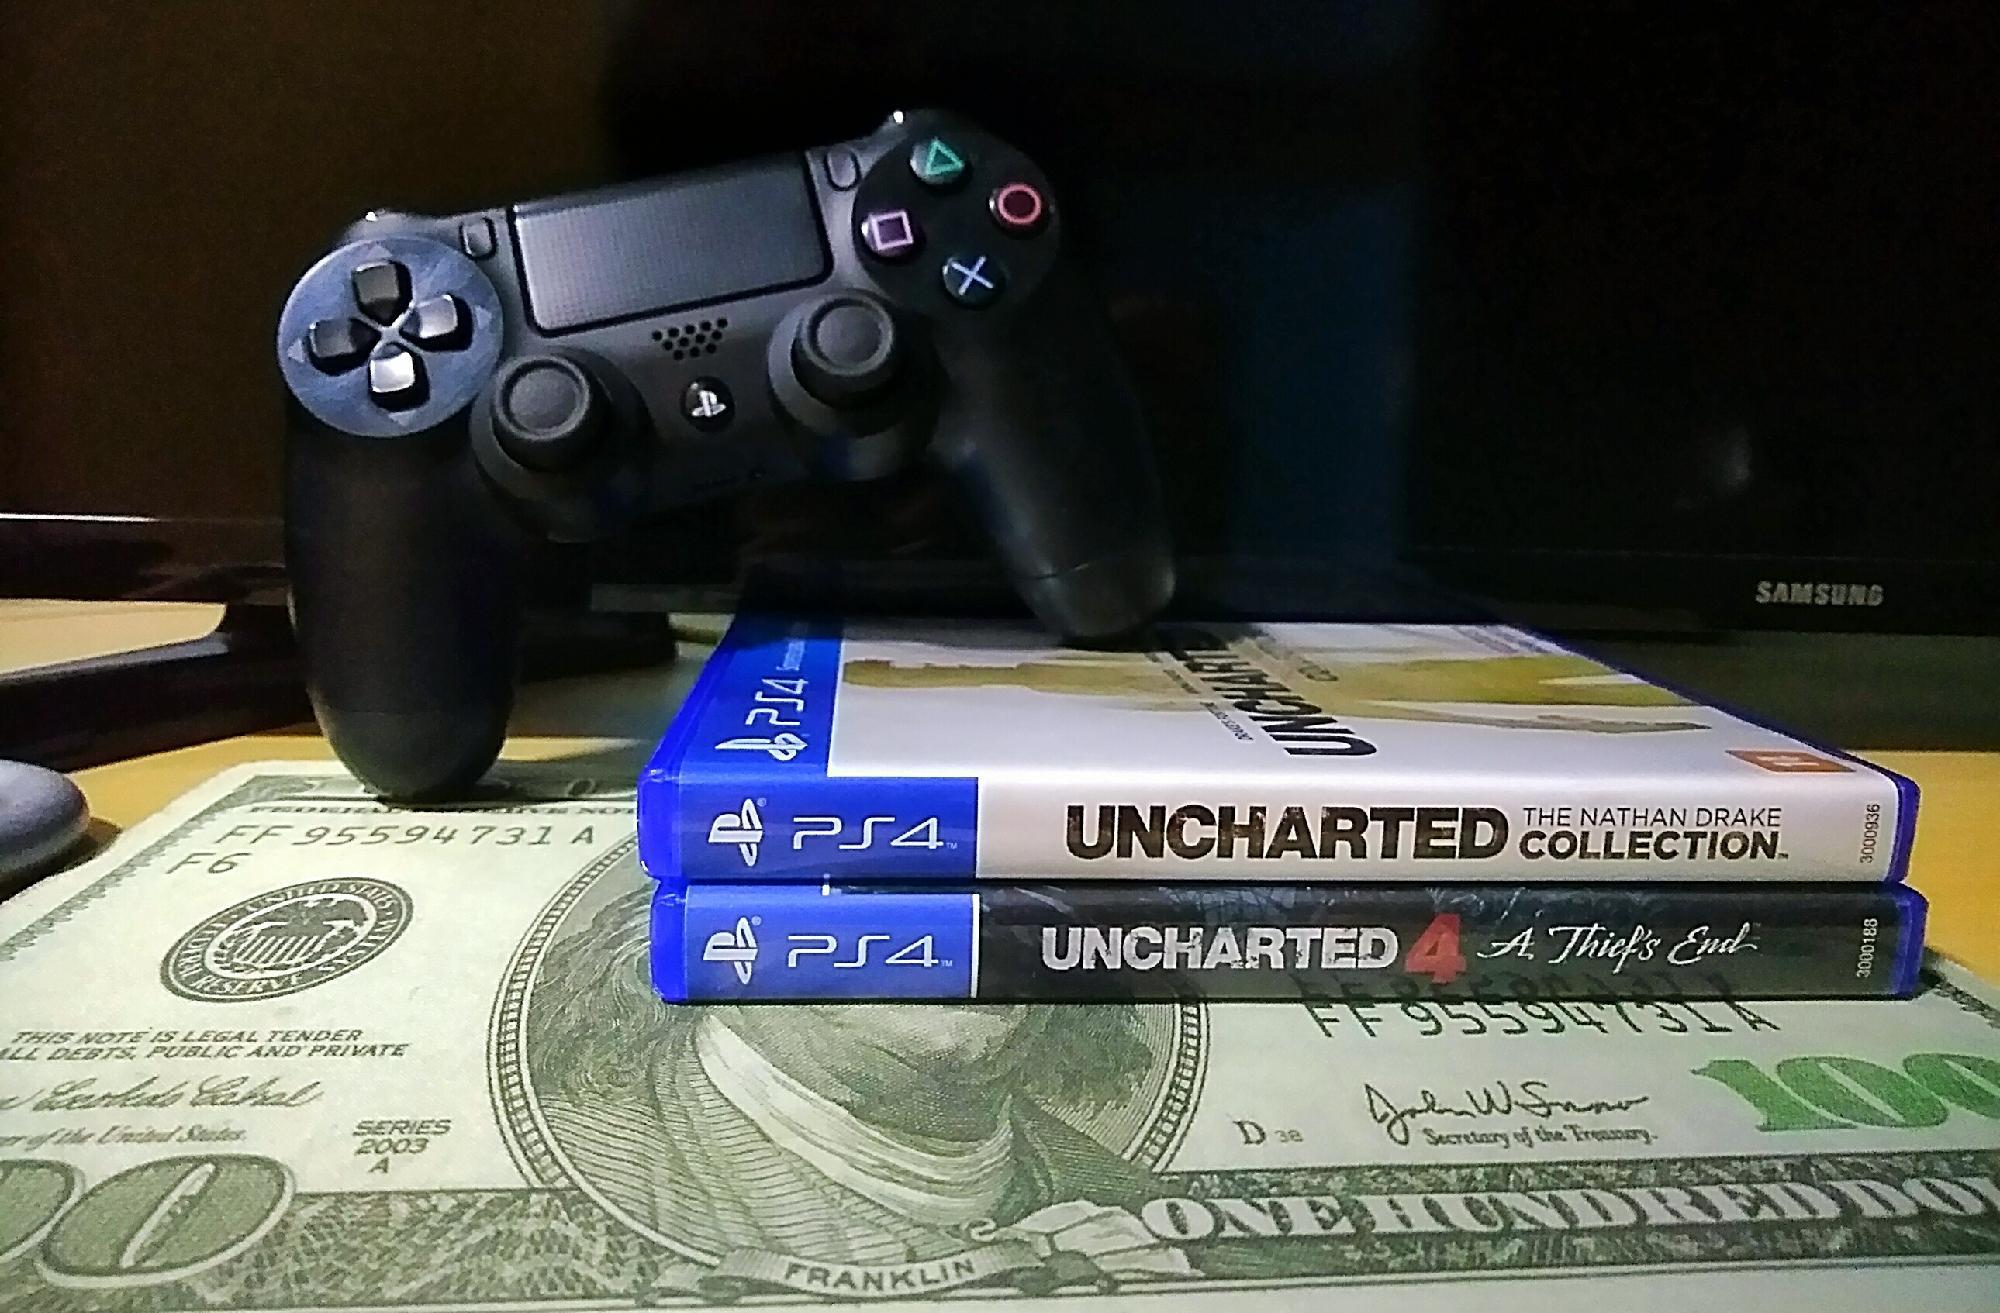 Uncharted's